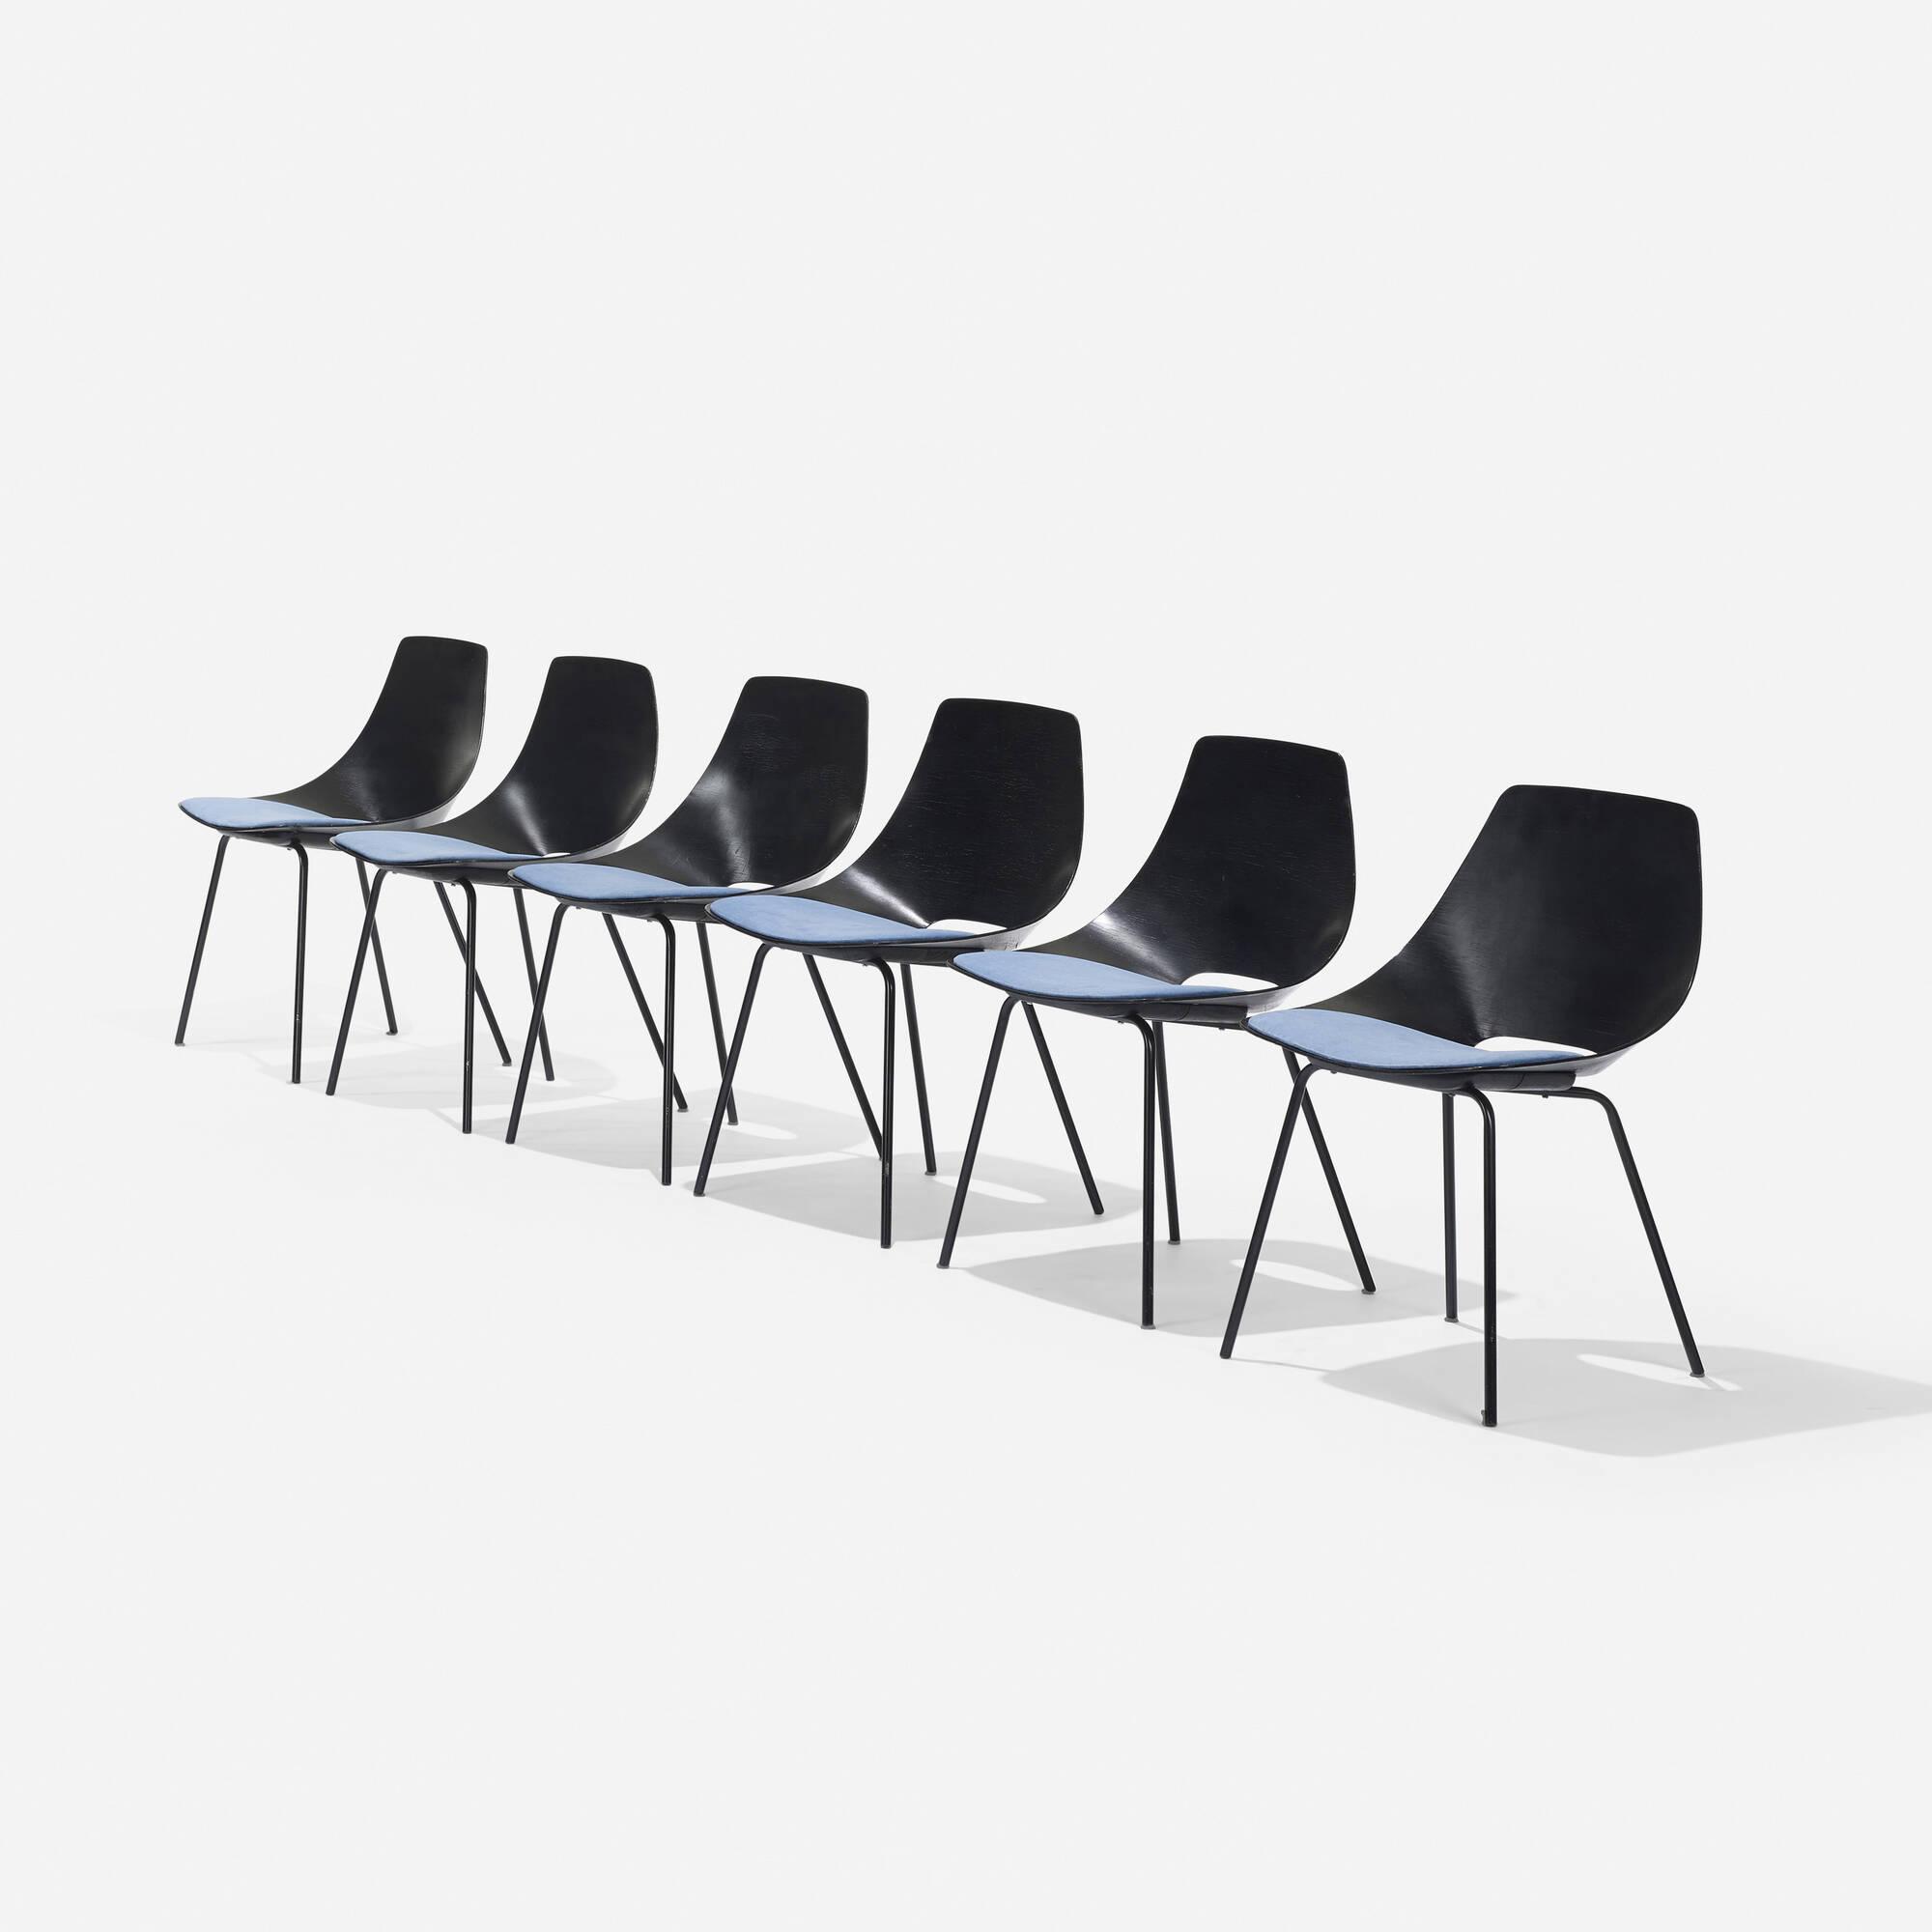 314: Pierre Guariche / Tonneau chairs, set of six (1 of 4)